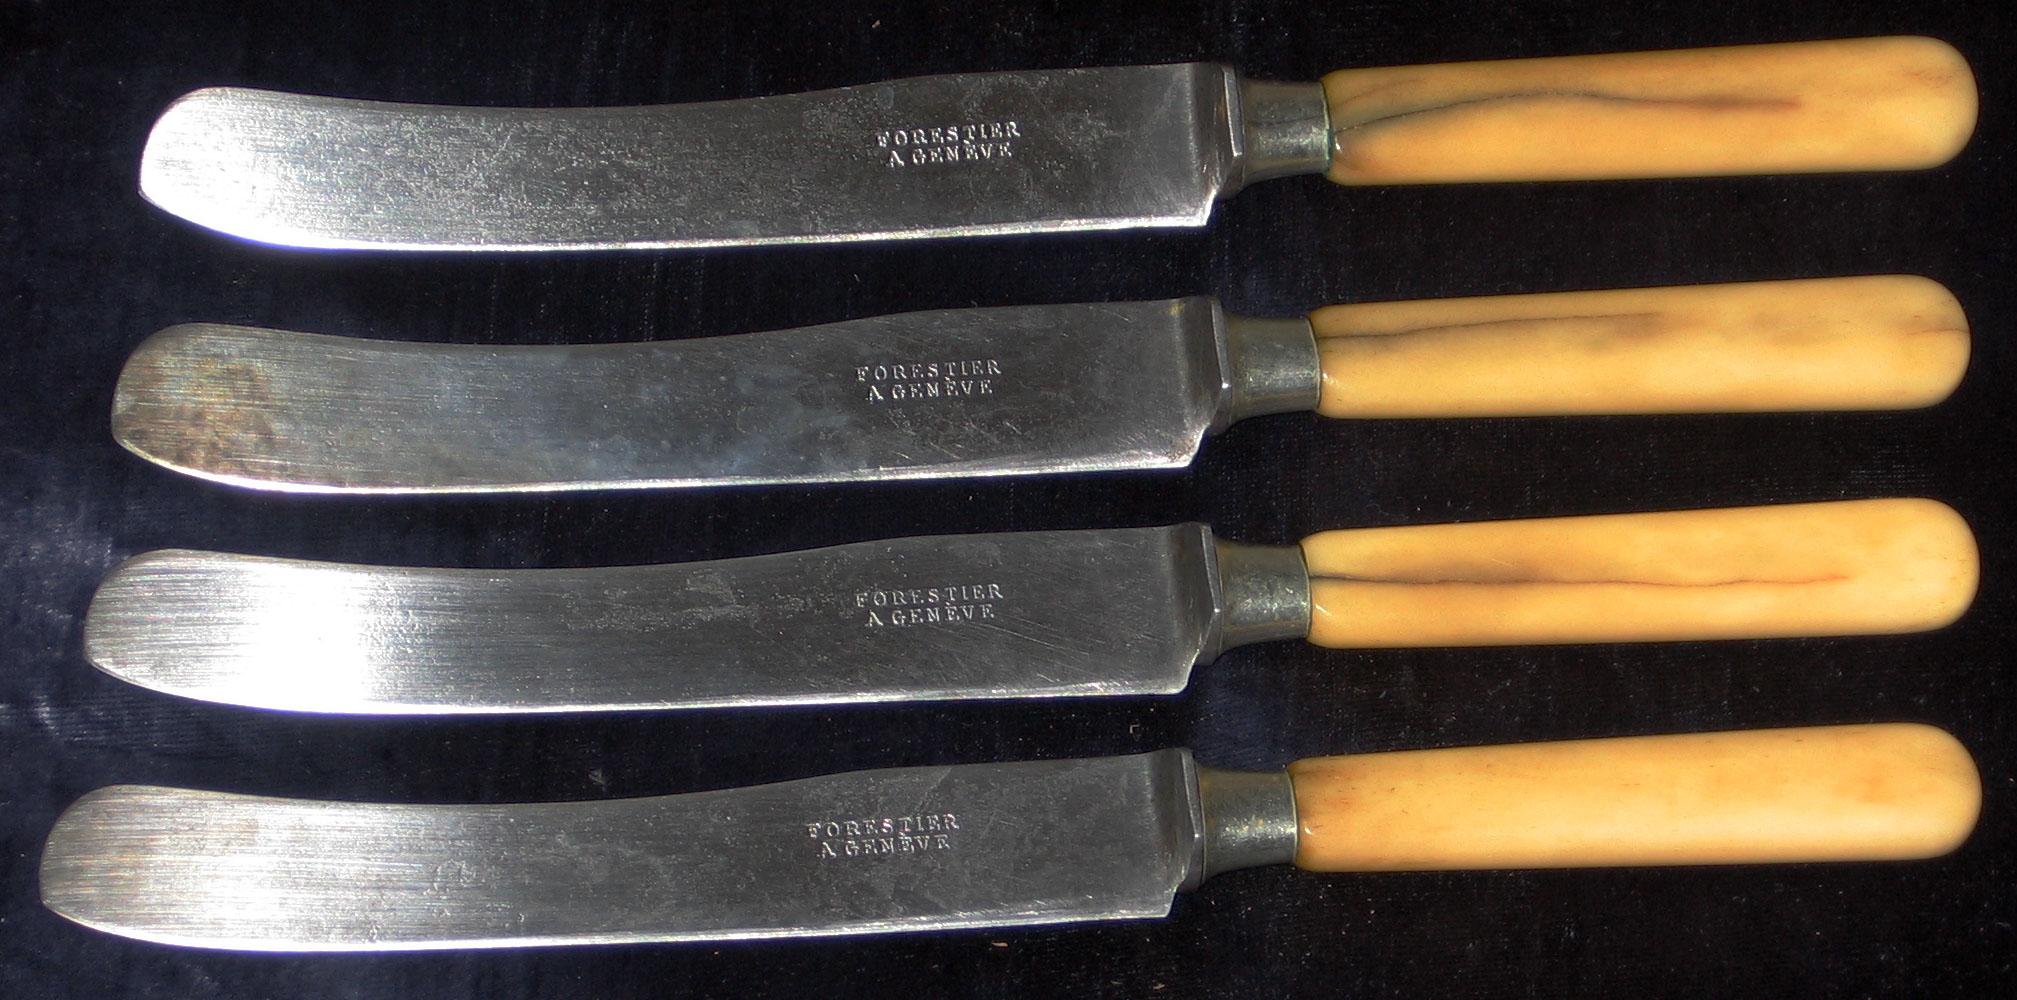 wiki knife upcscavenger kitchen knife 183 armamc arma mc wiki 183 github